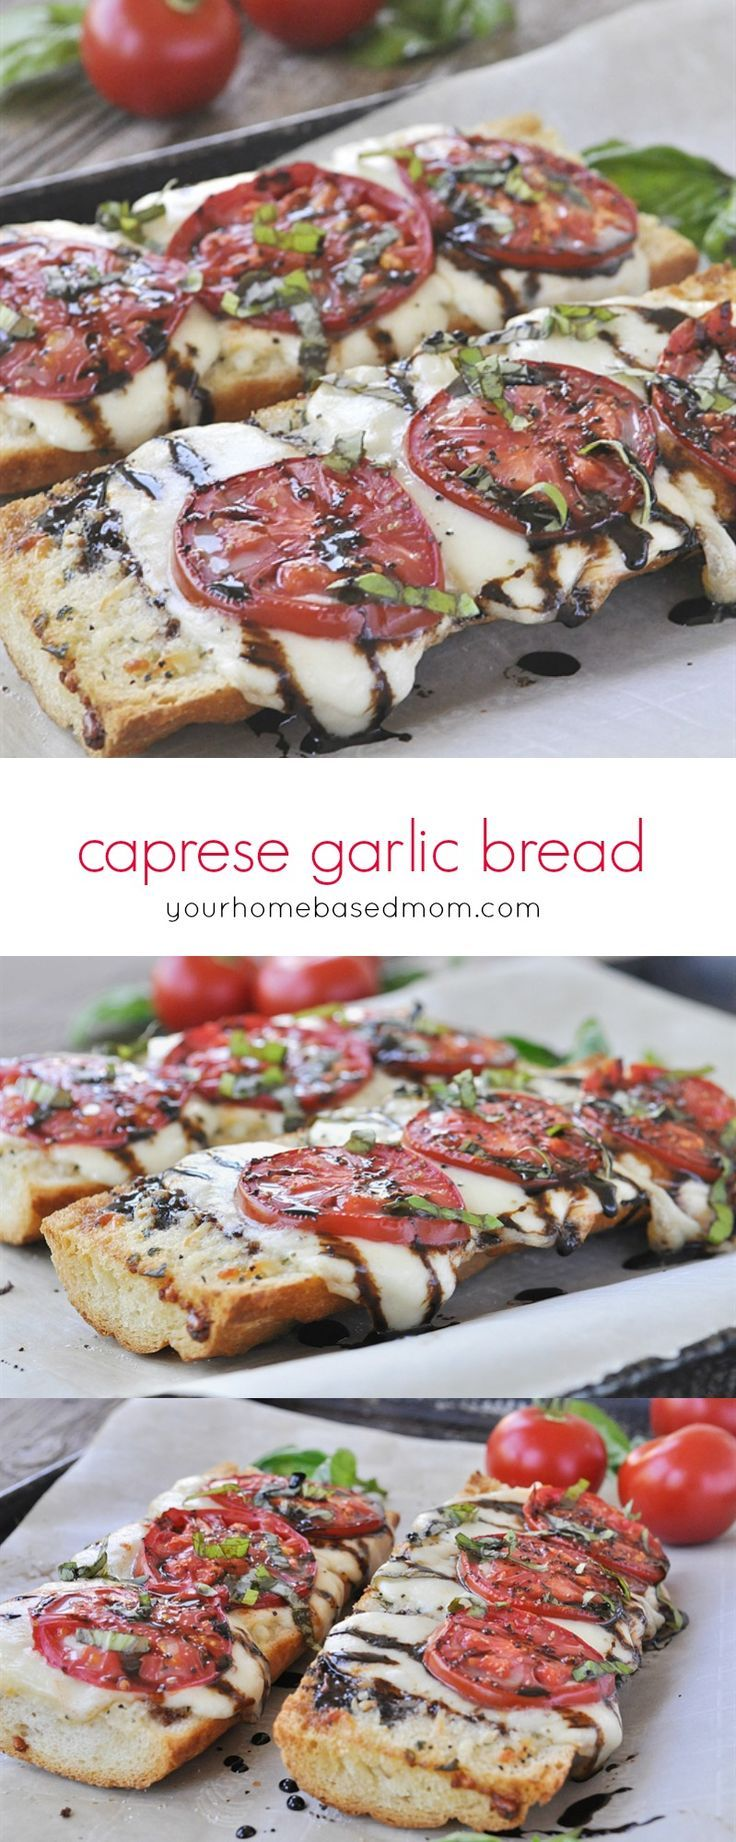 Caprese Garlic Bread Recipe - wonderful as a lunch, appetizer or dinner!